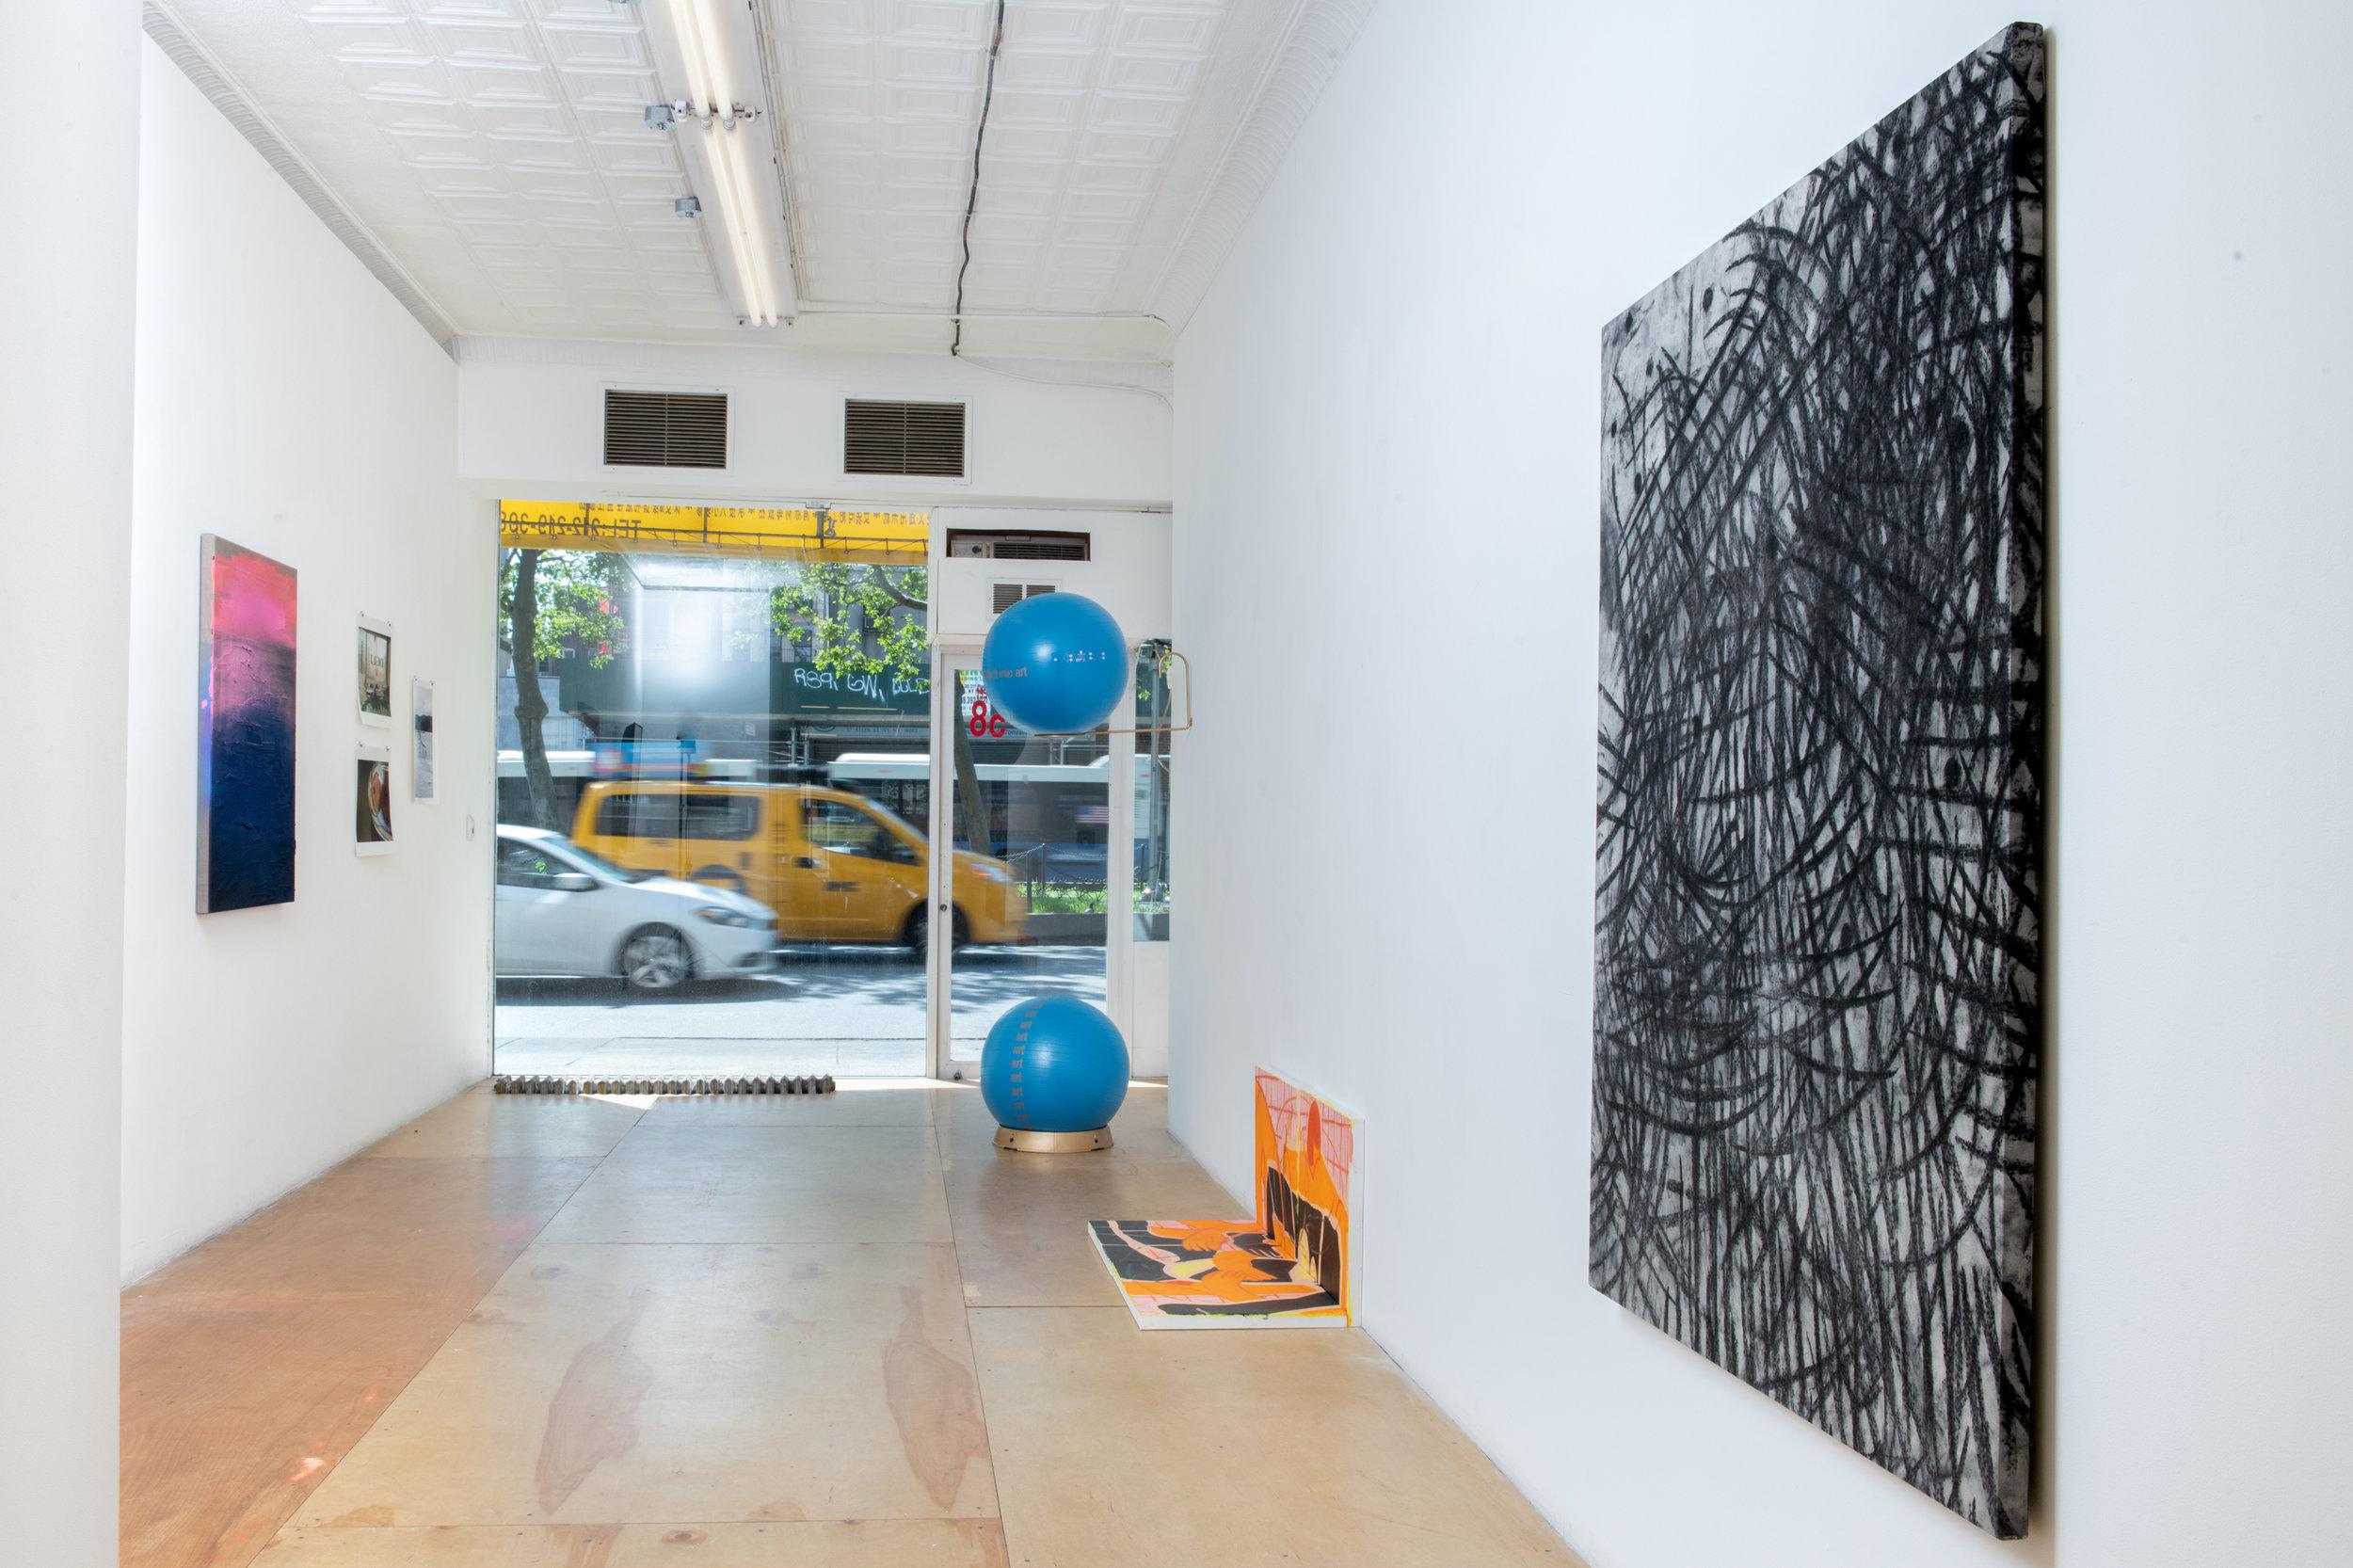 Here + Now Installation view at Pablo's Birthday Focus: Paul Weiner, Thanee Lonsdale, Irati Inoriza, Jonathan Todryk, and Tara Wray Photograph by - Edoardo Cozzani